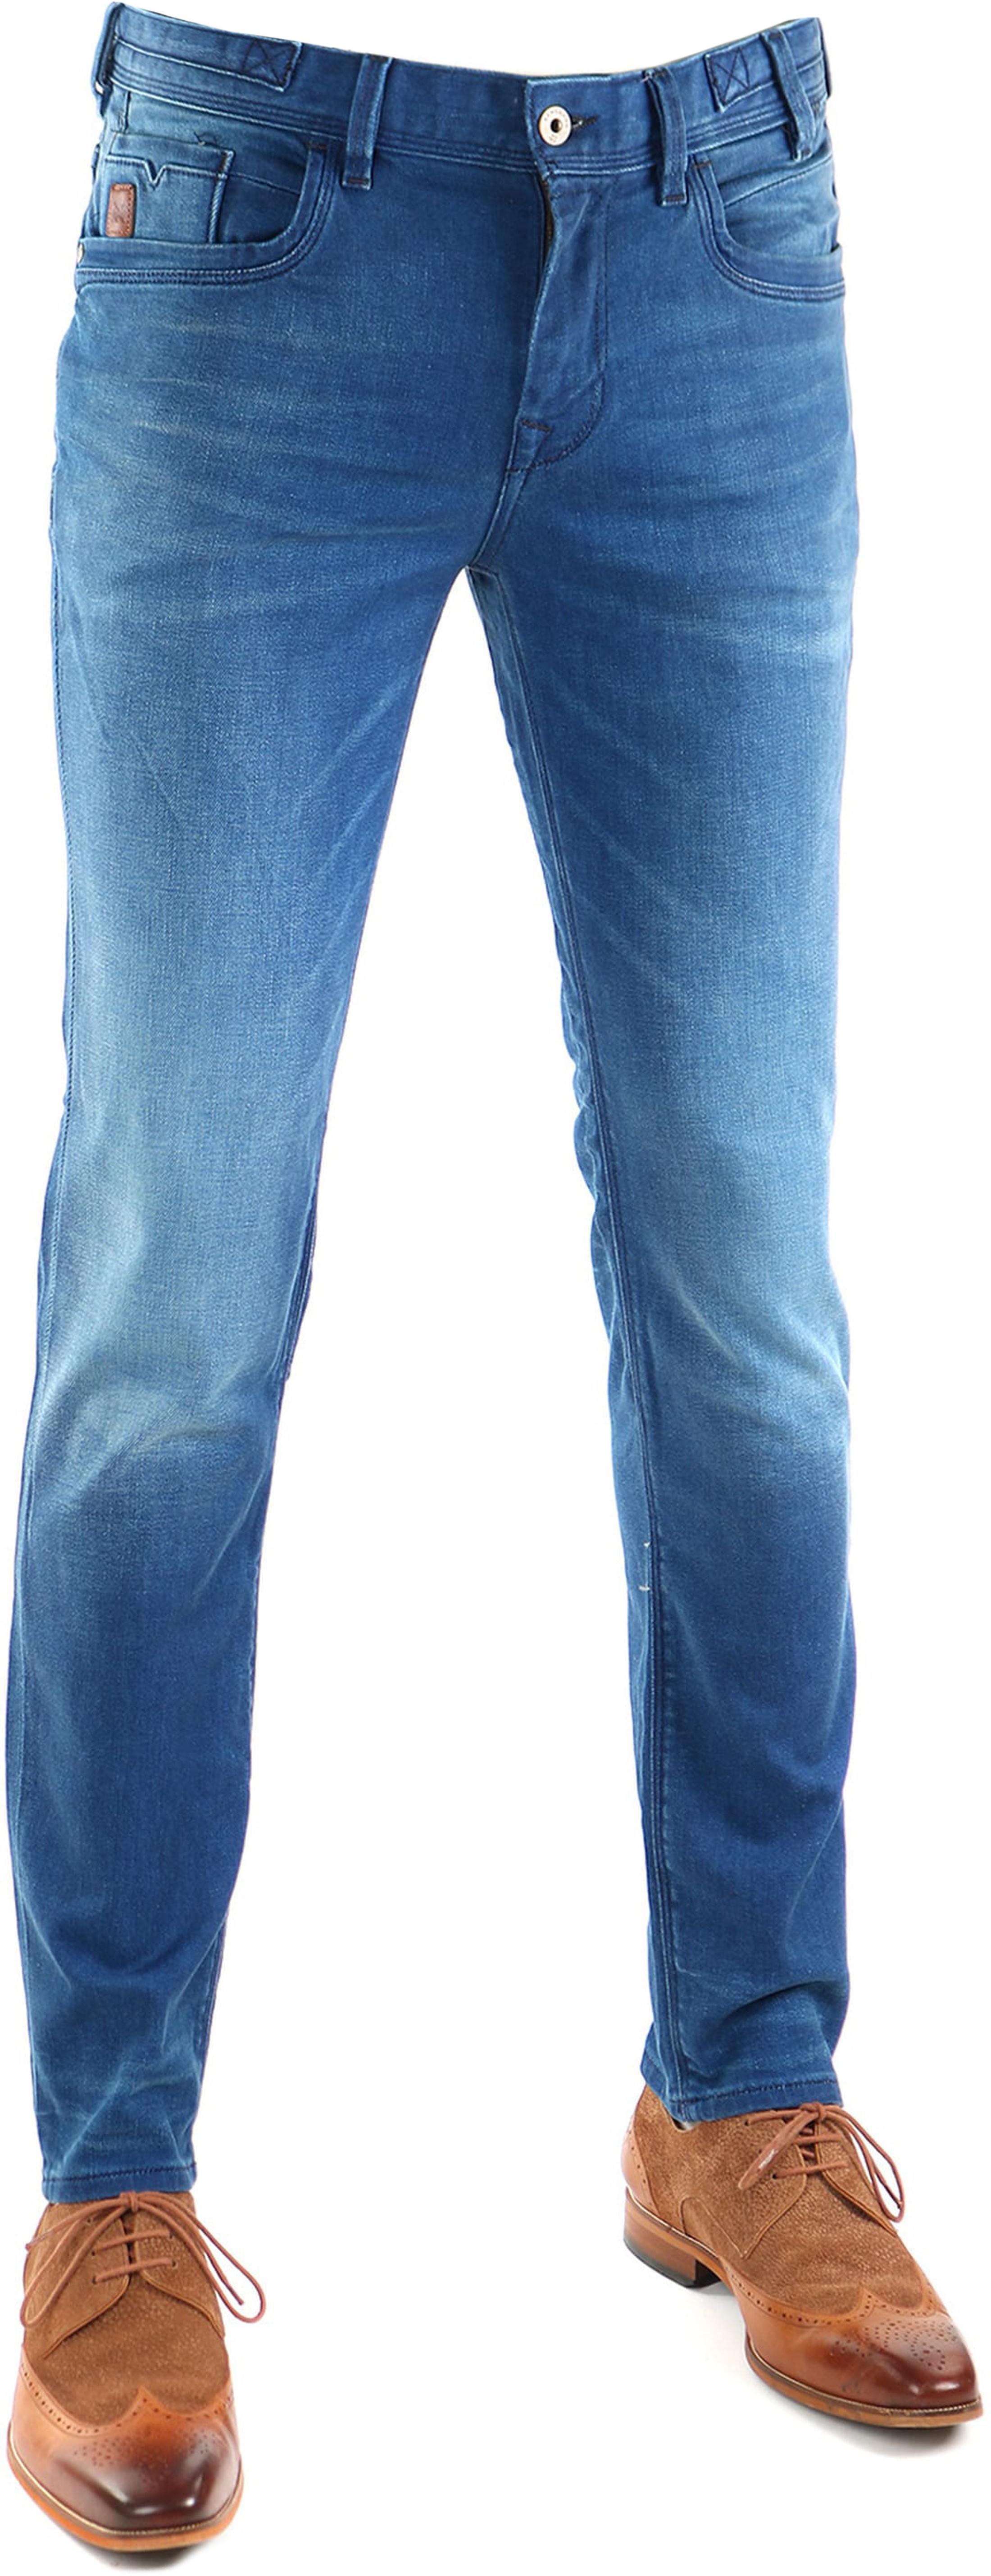 Vanguard V8 Jeans Blau foto 0